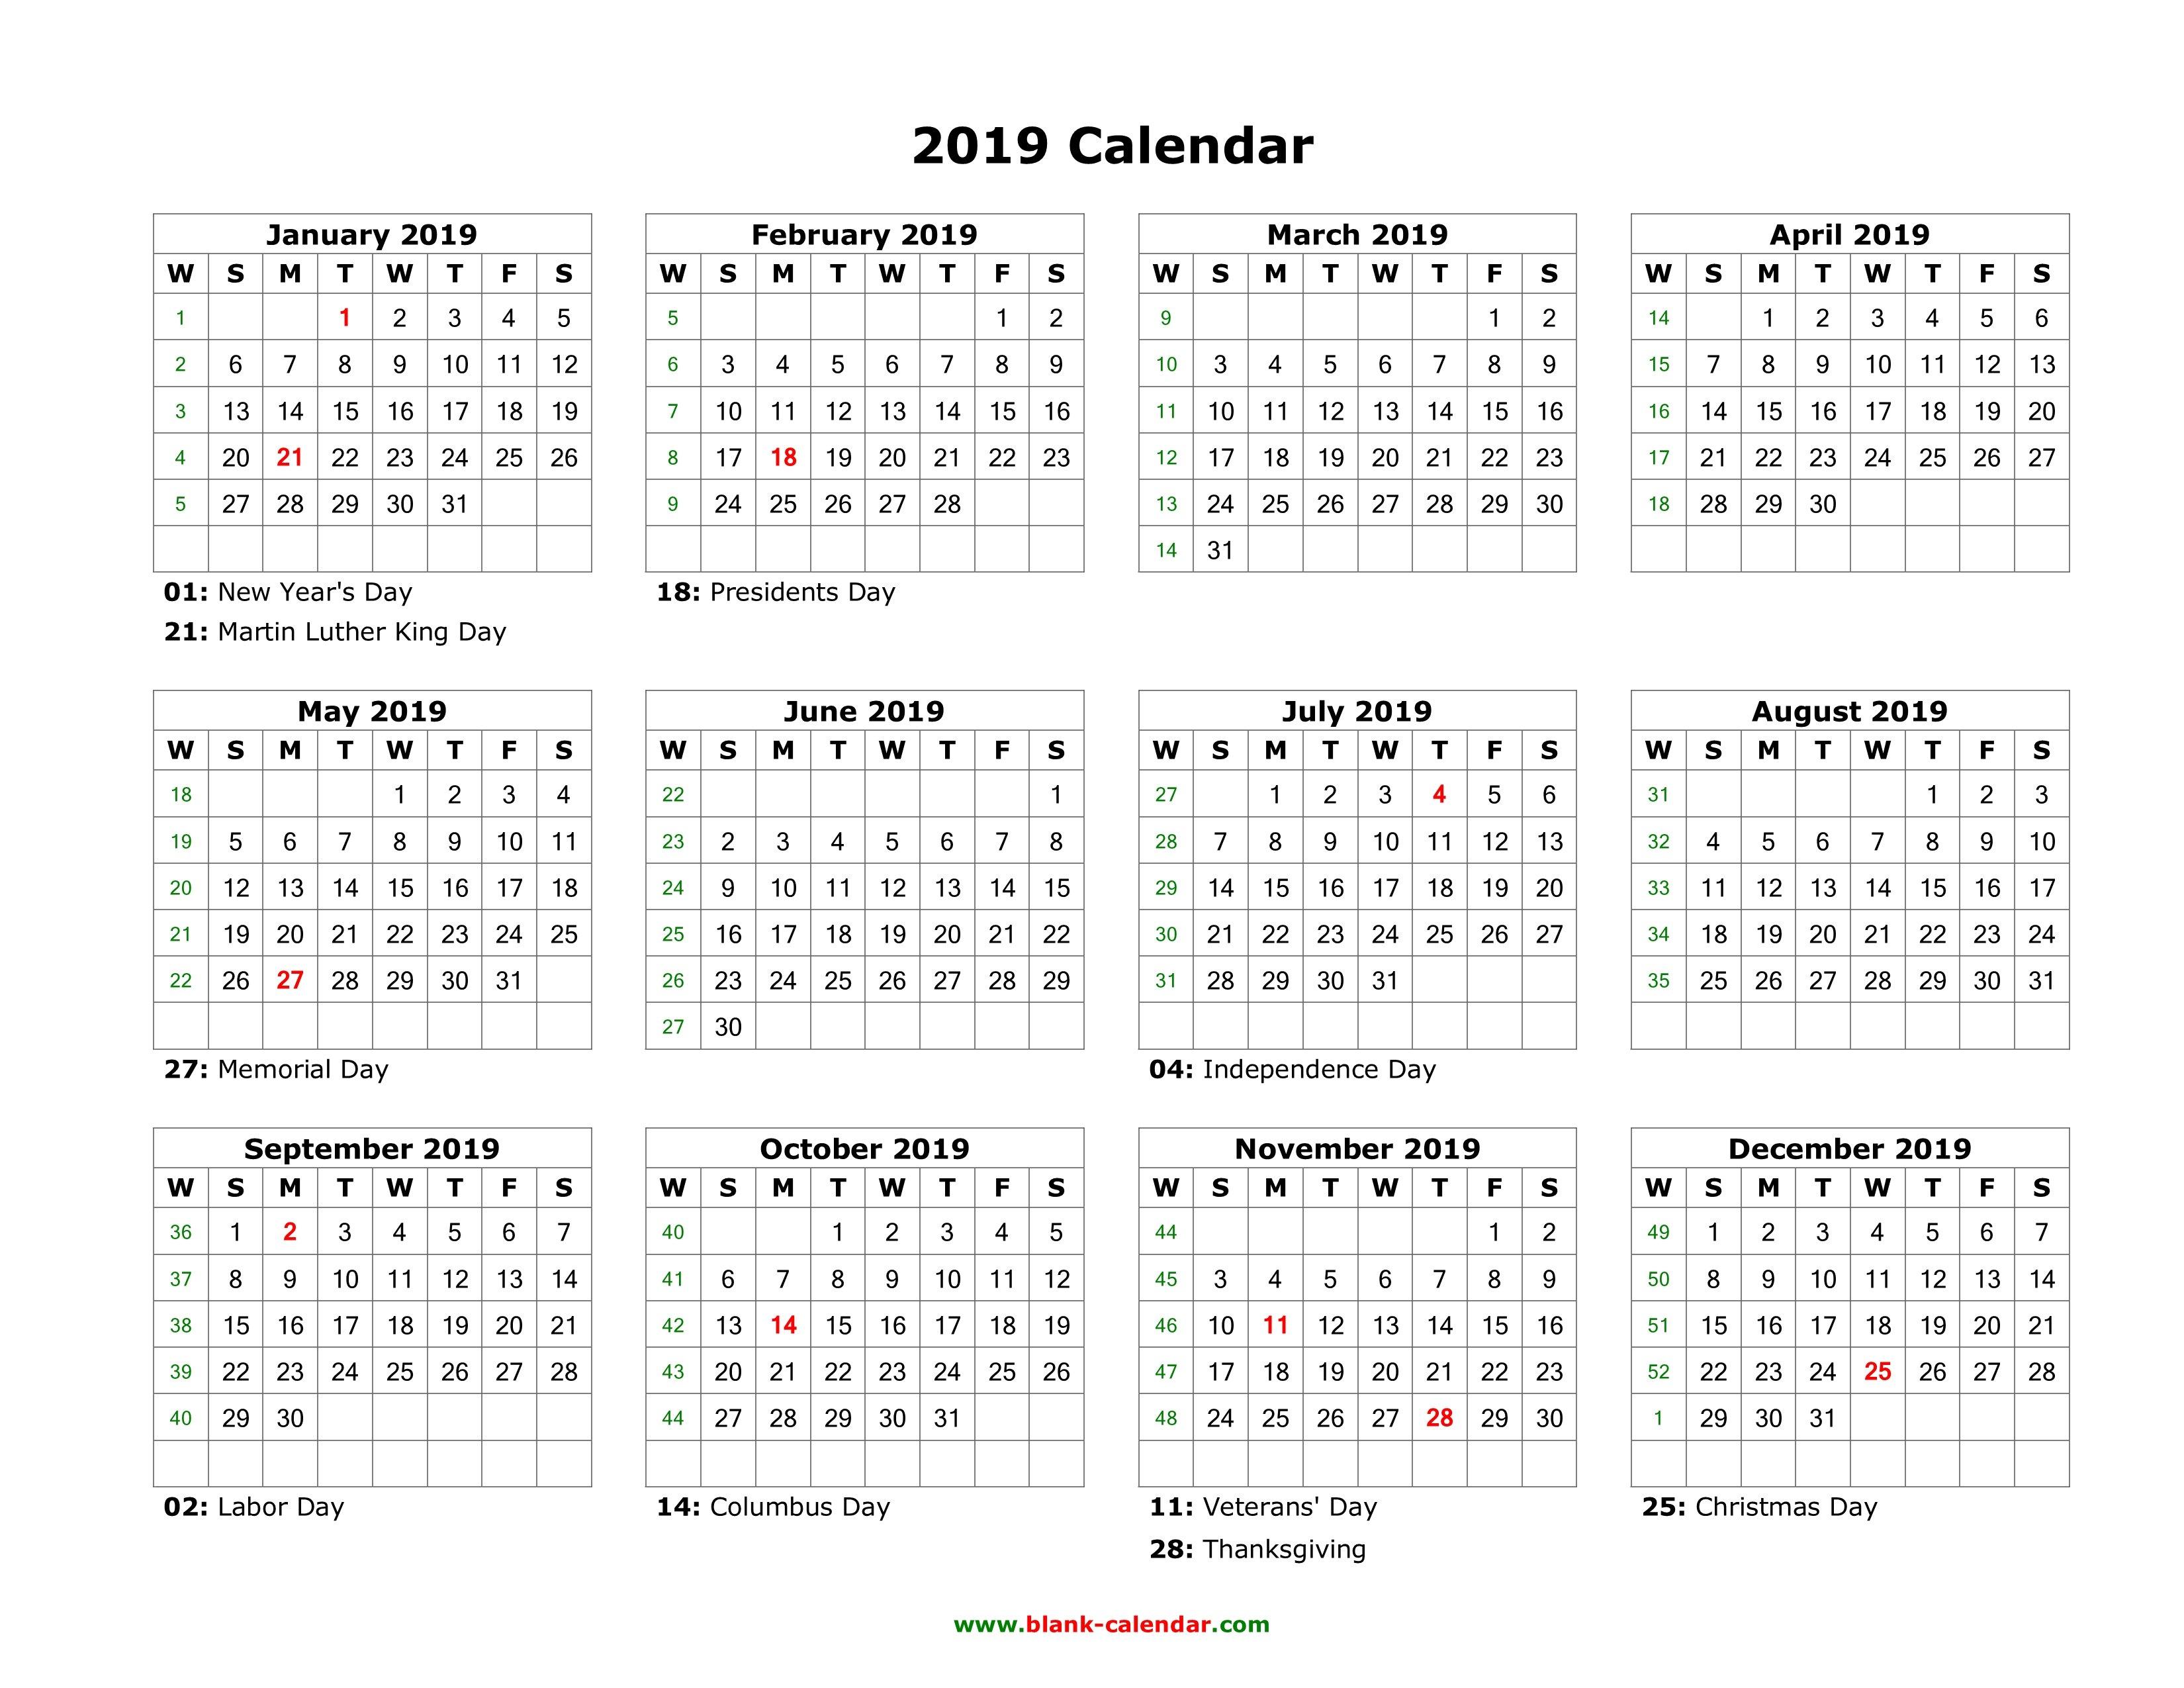 Blank Calendar 2019 | Free Download Calendar Templates Calendar 2019 Entire Year